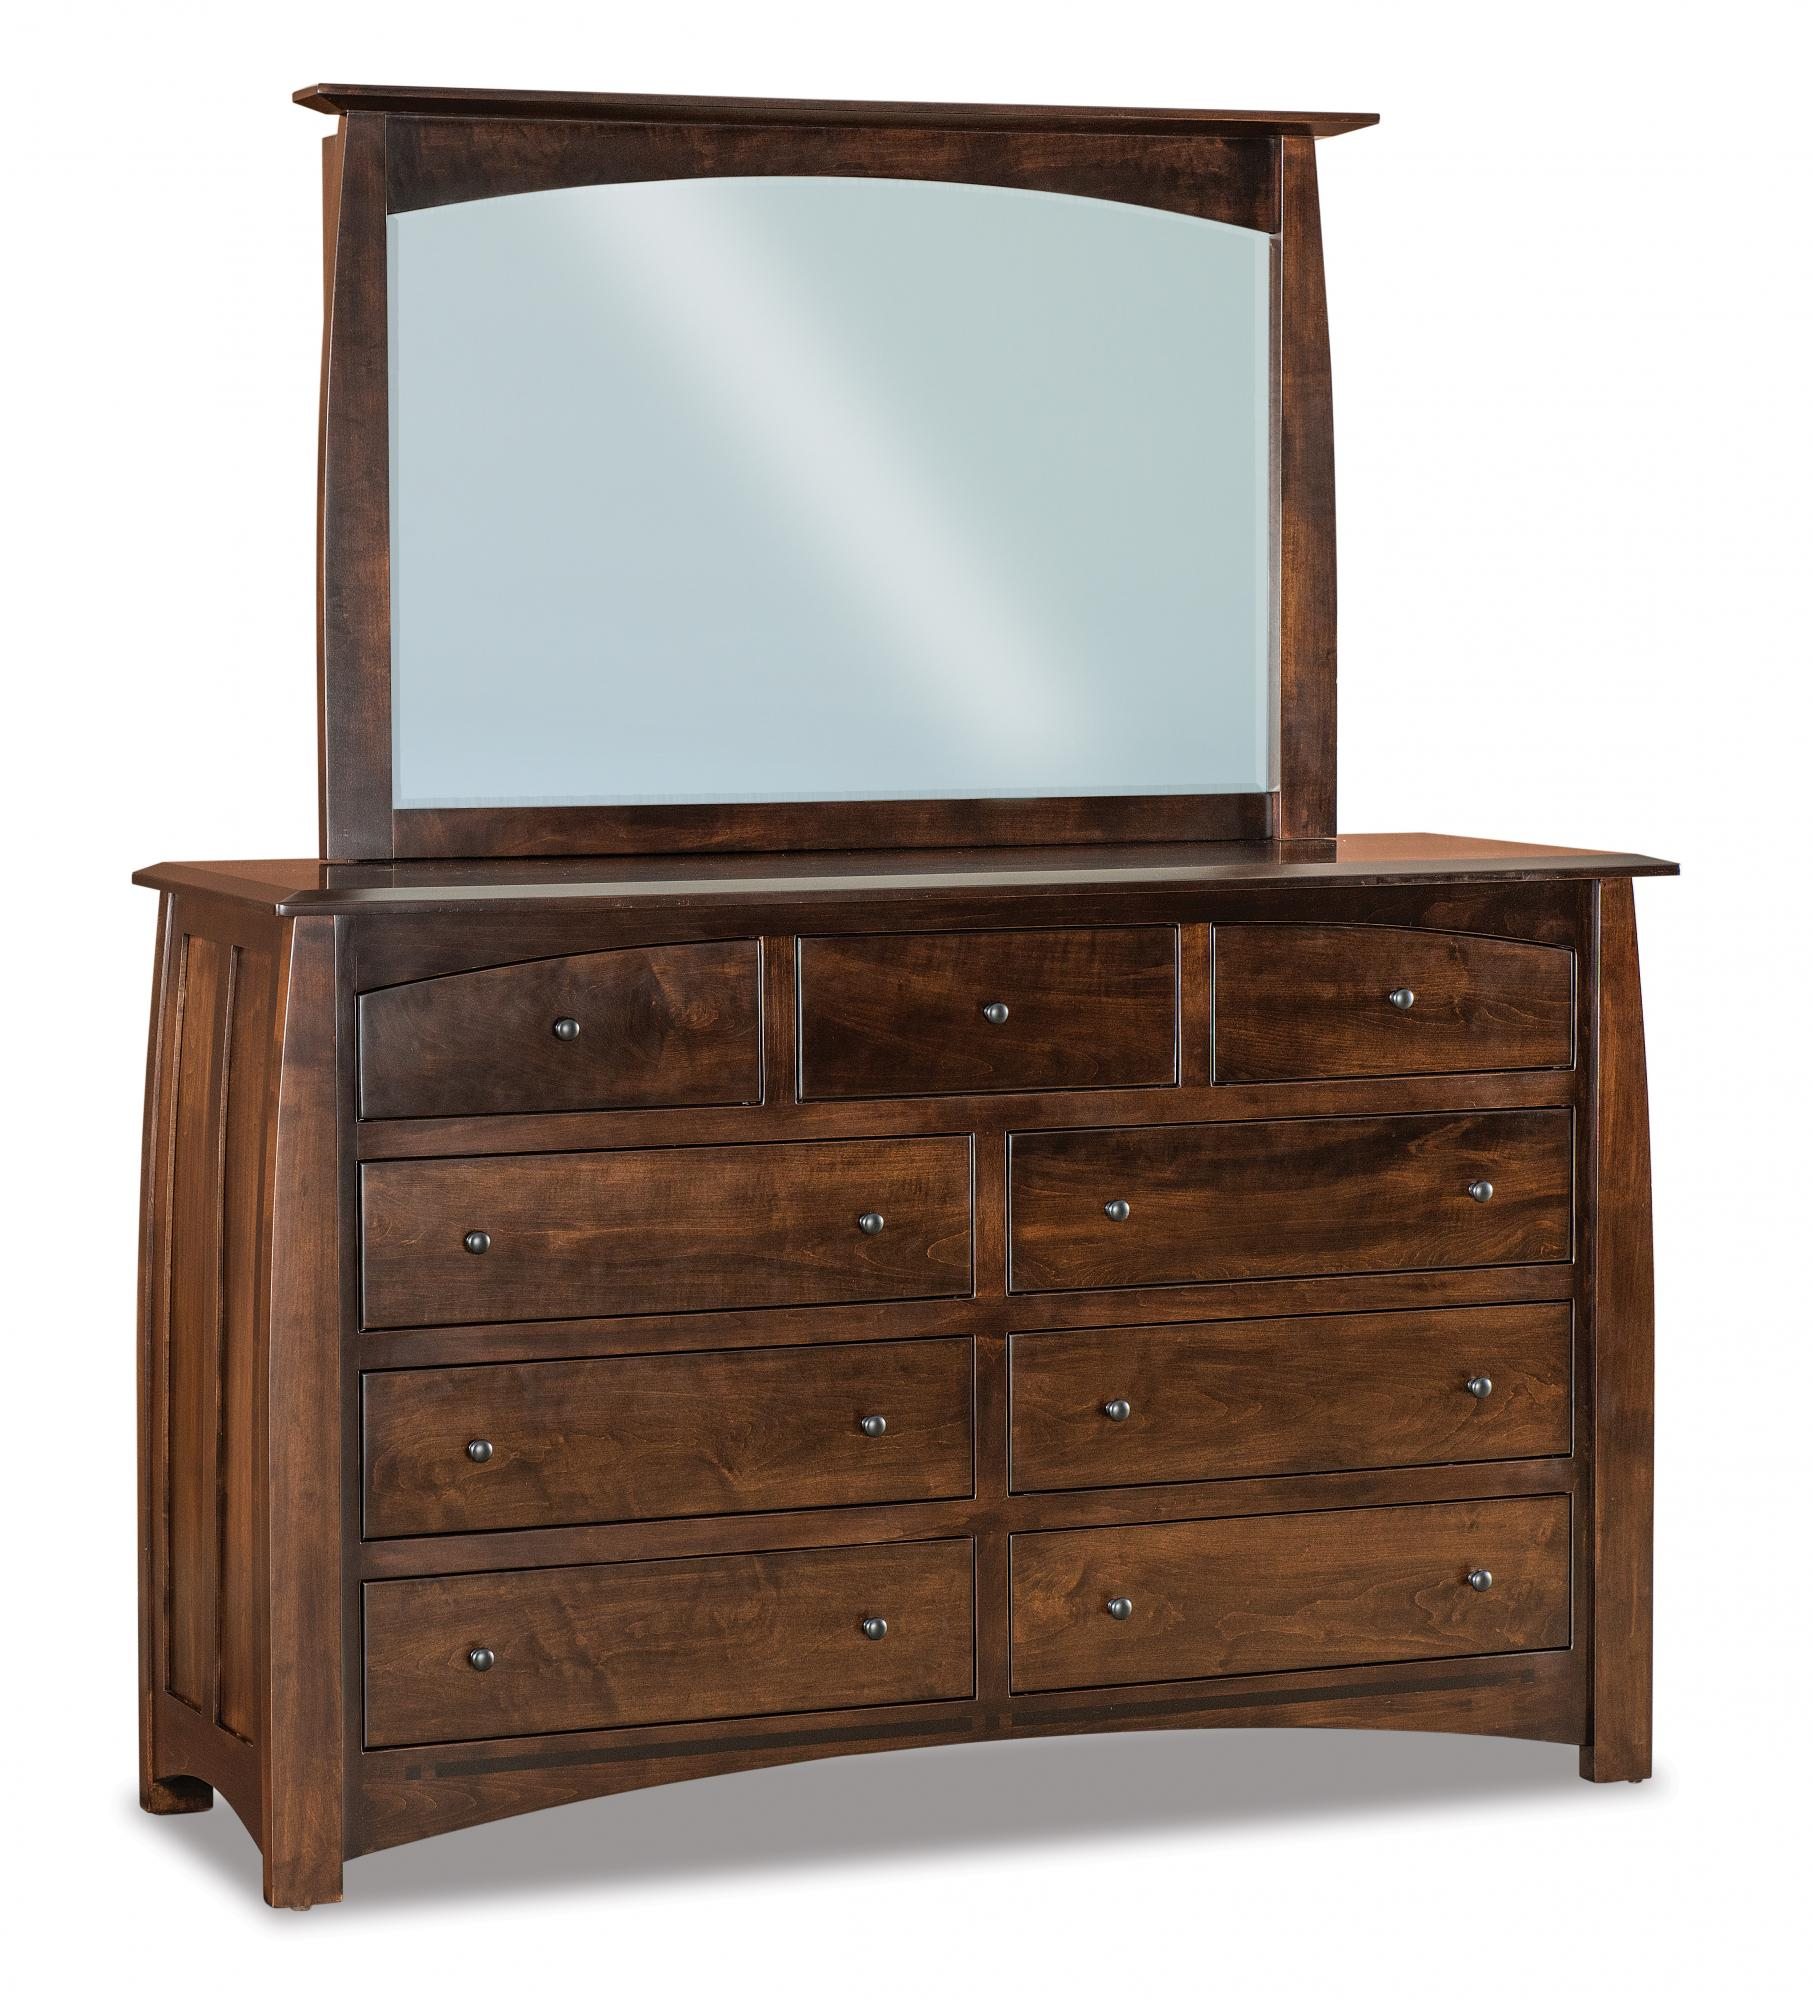 Boulder Creek 9 Drawer Dressers Amish Furniture Store Mankato Mn